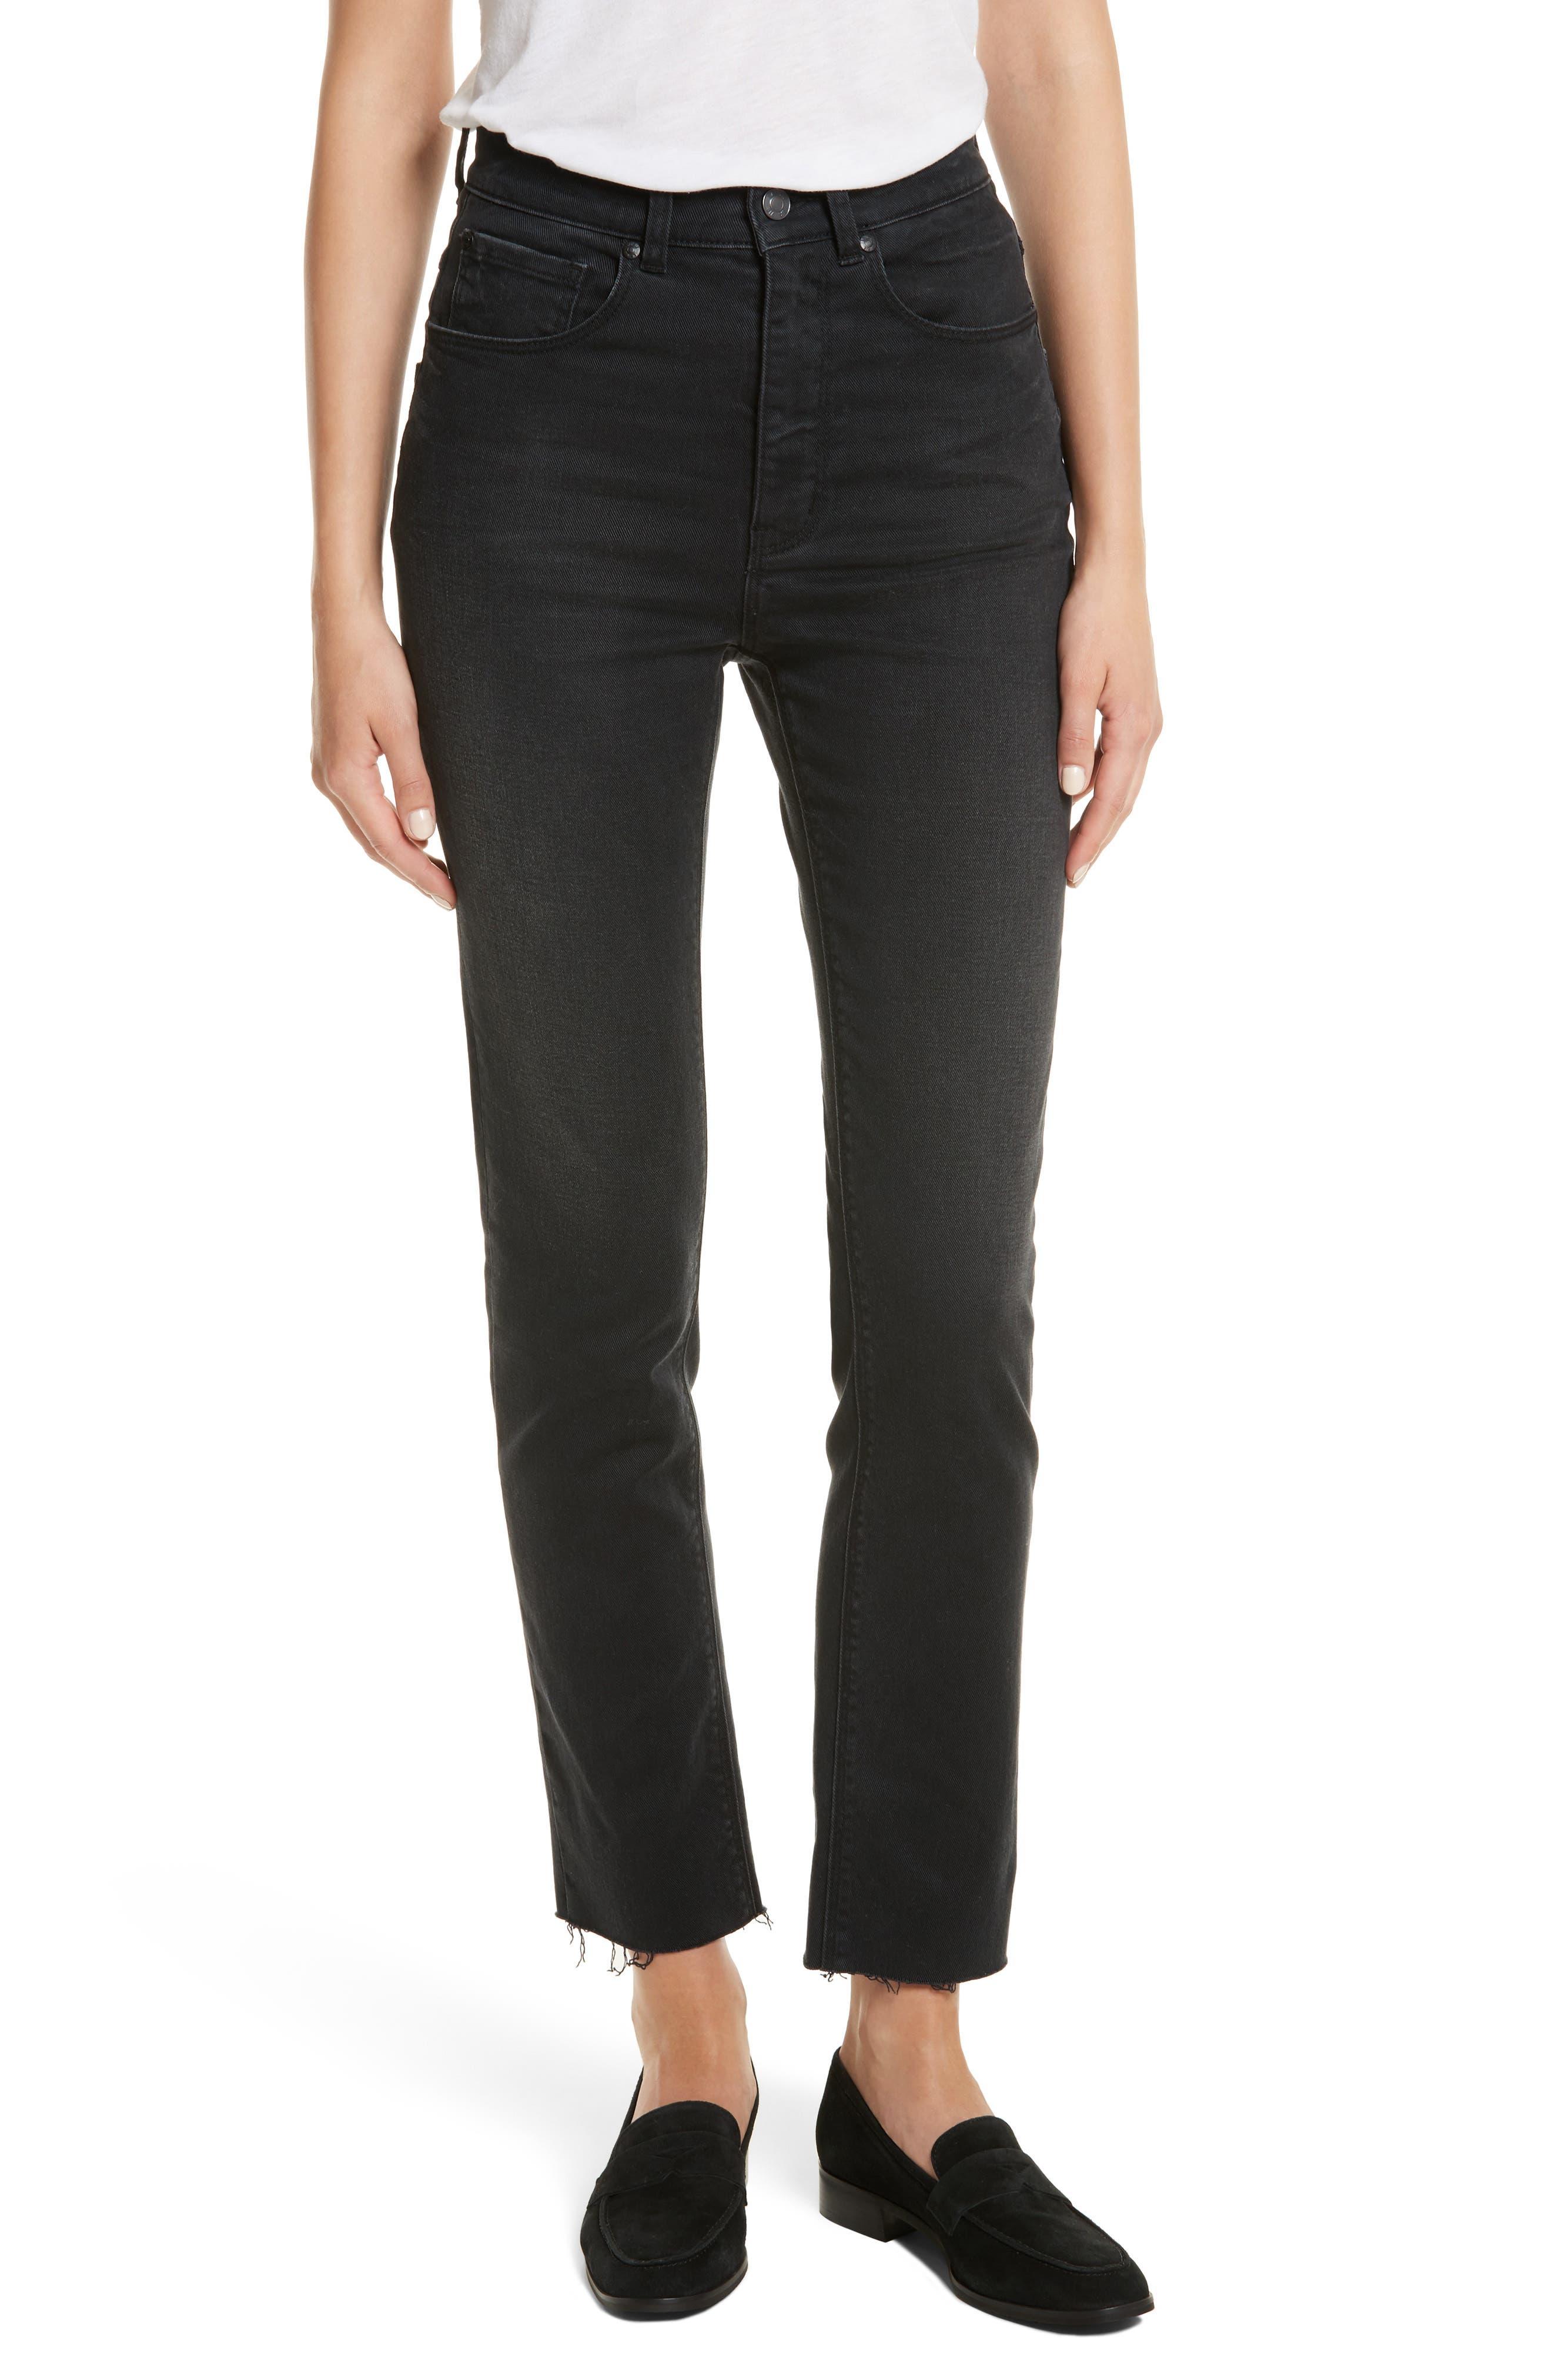 Main Image - Rebecca Taylor Ines Crop High Waist Skinny Jeans (Charcoal)